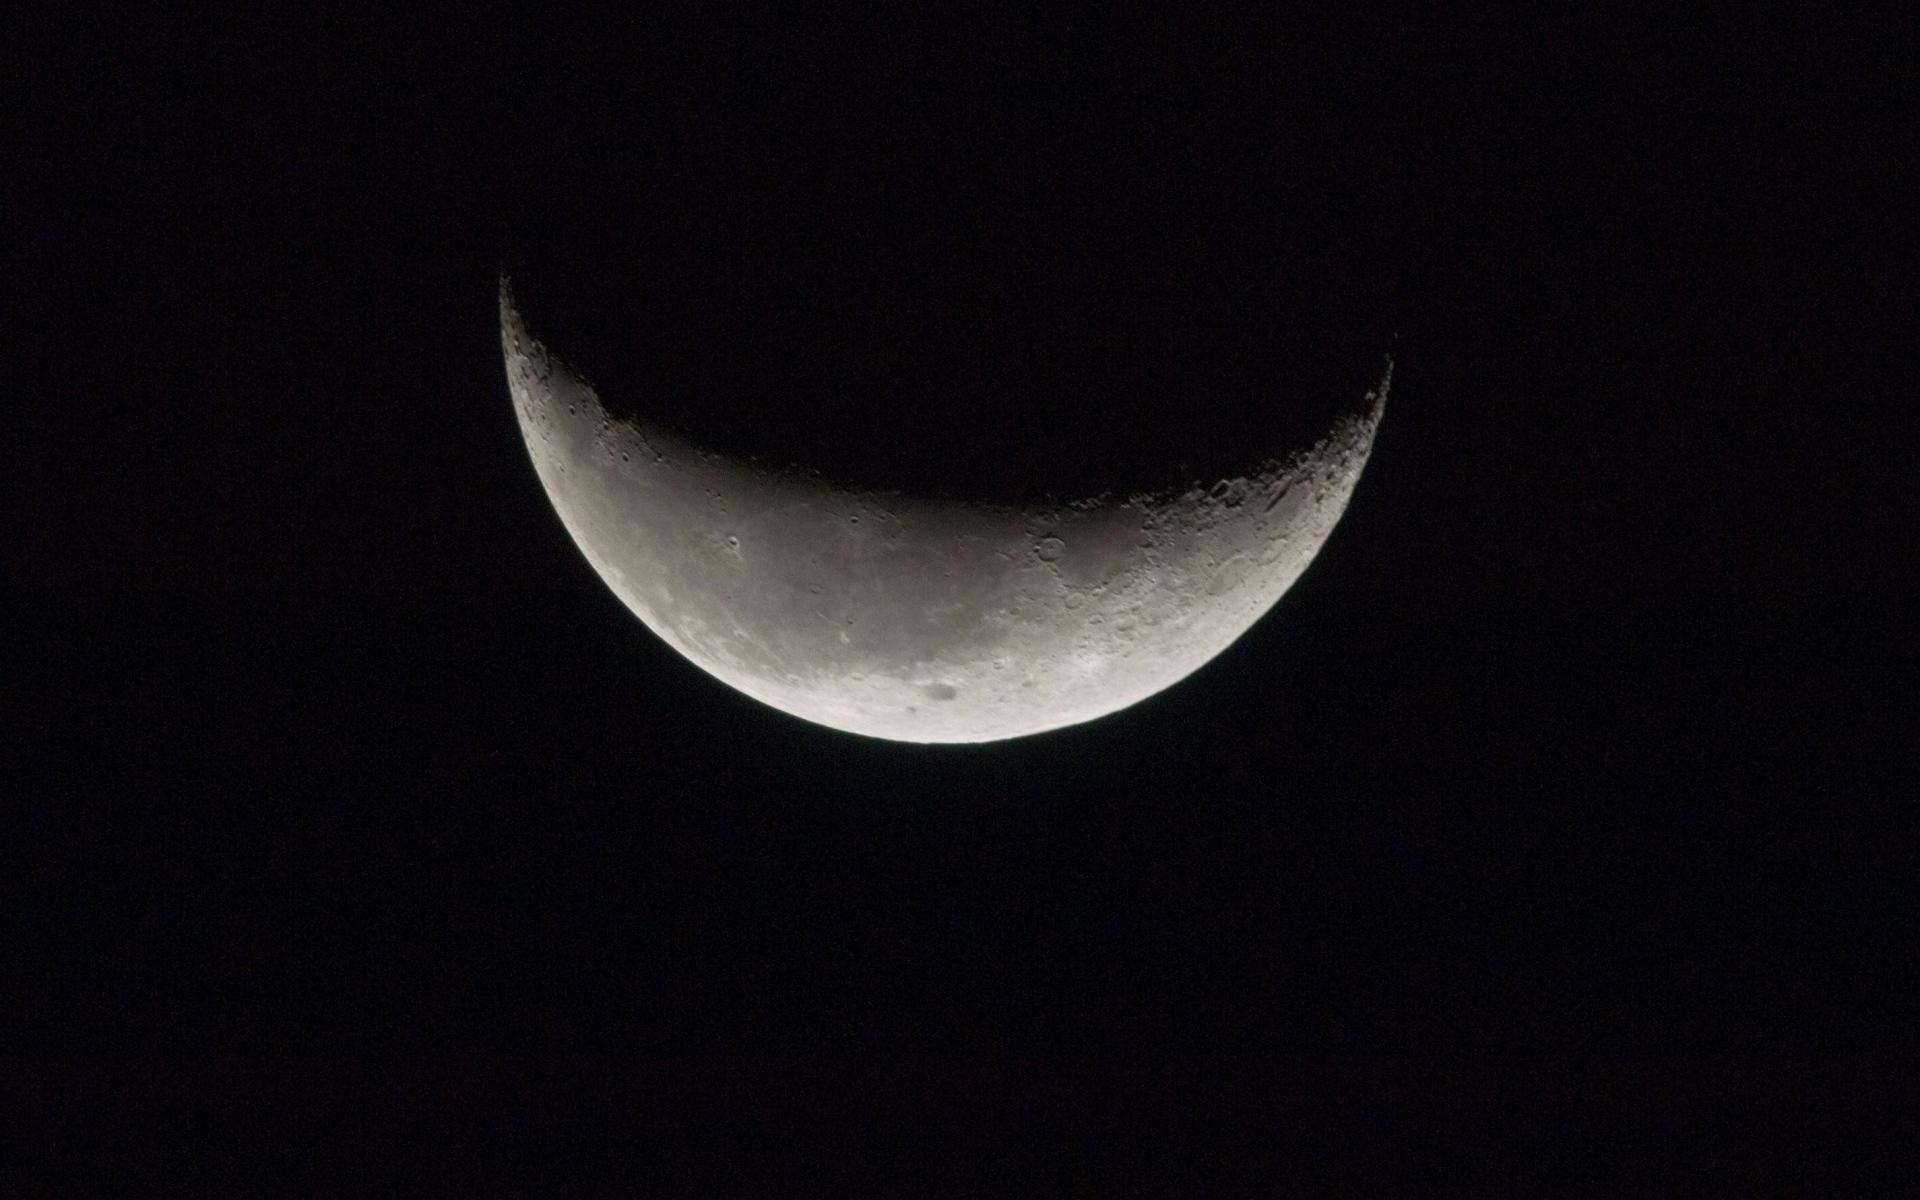 Картинки Луна, космос, спутник, bw фото и обои на рабочий стол